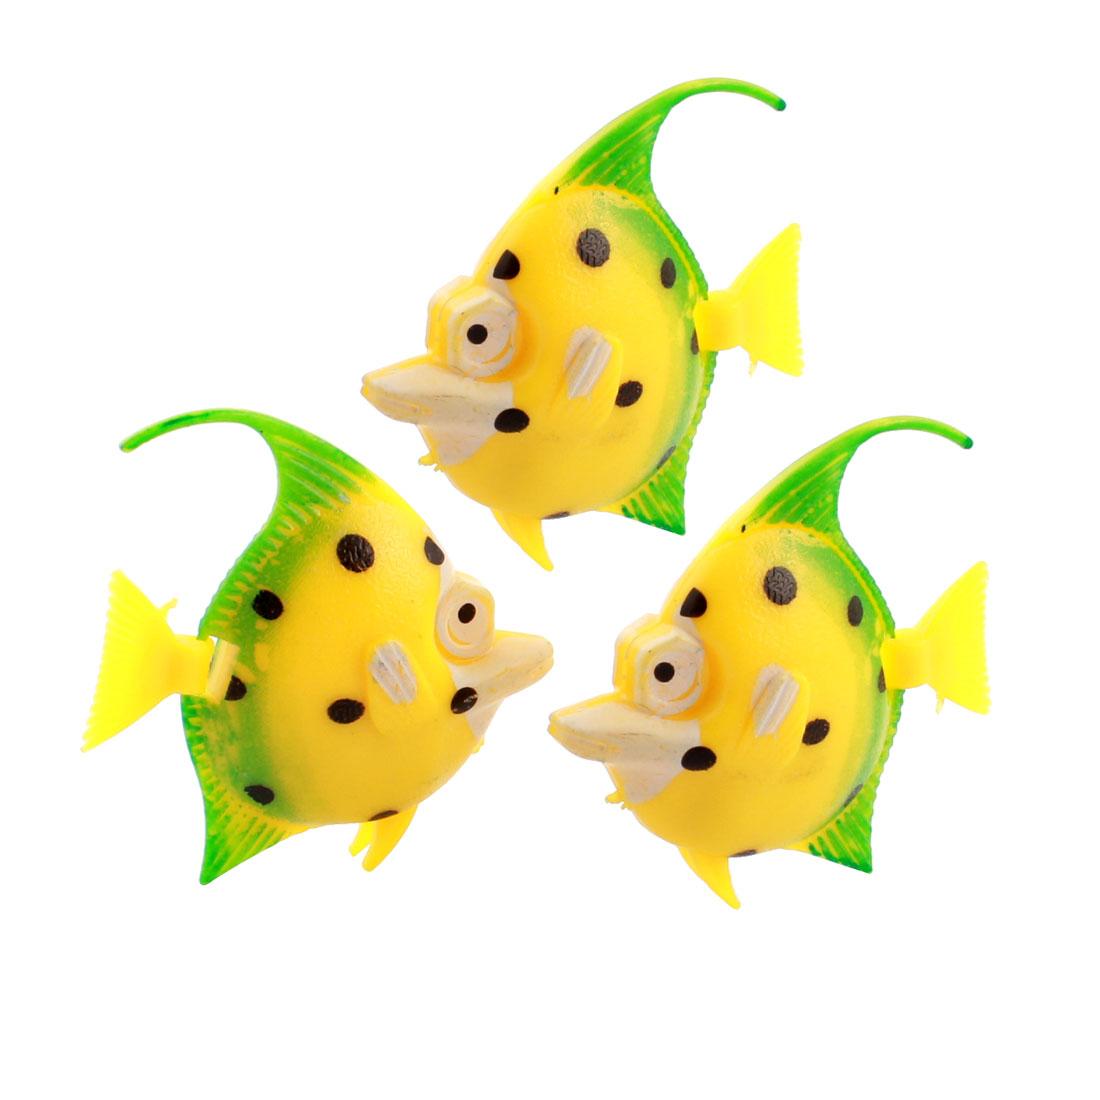 3 Pcs Aquarium Manmade Wiggly Tail Swimming Fishes Decor Yellow Green